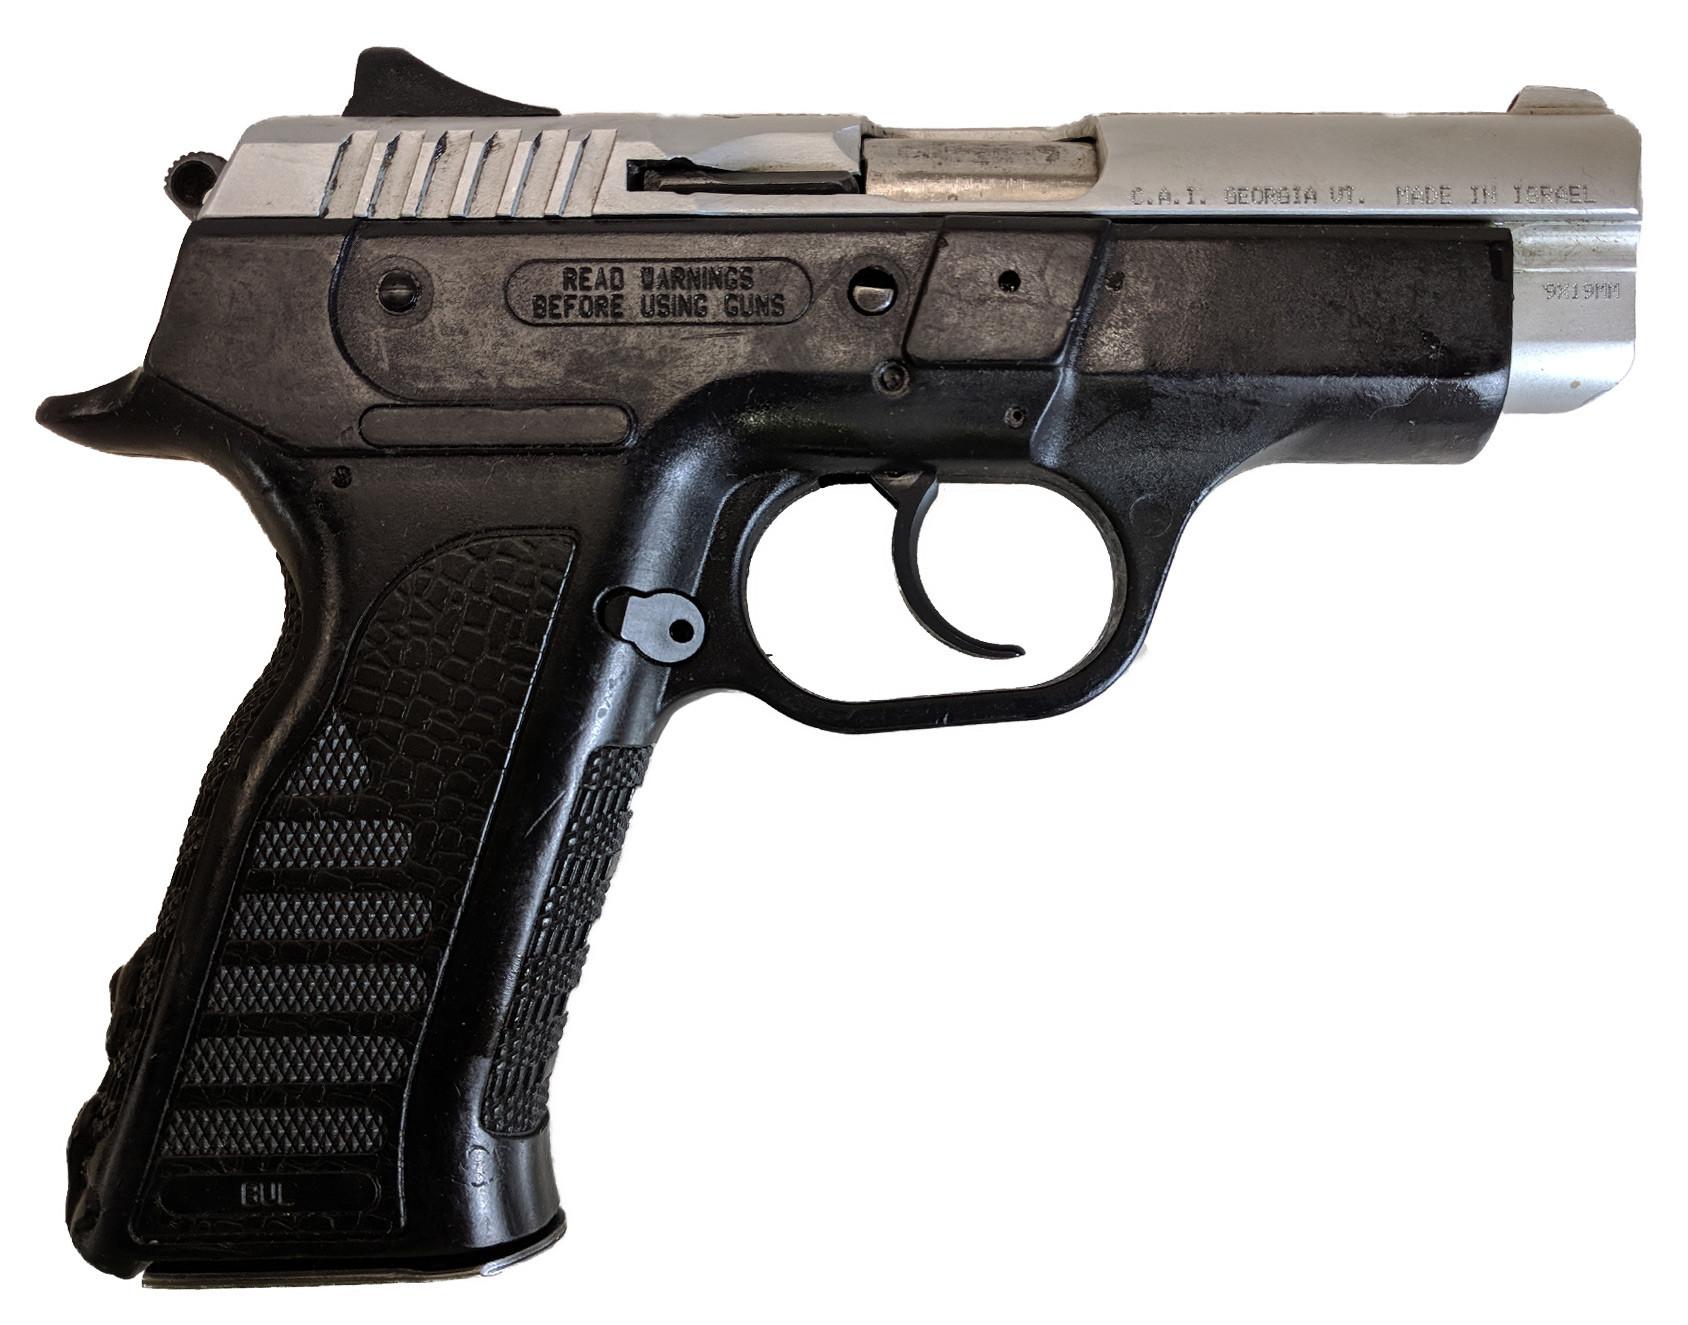 BUL Cherokee, 9mm, *Good, Incomplete*